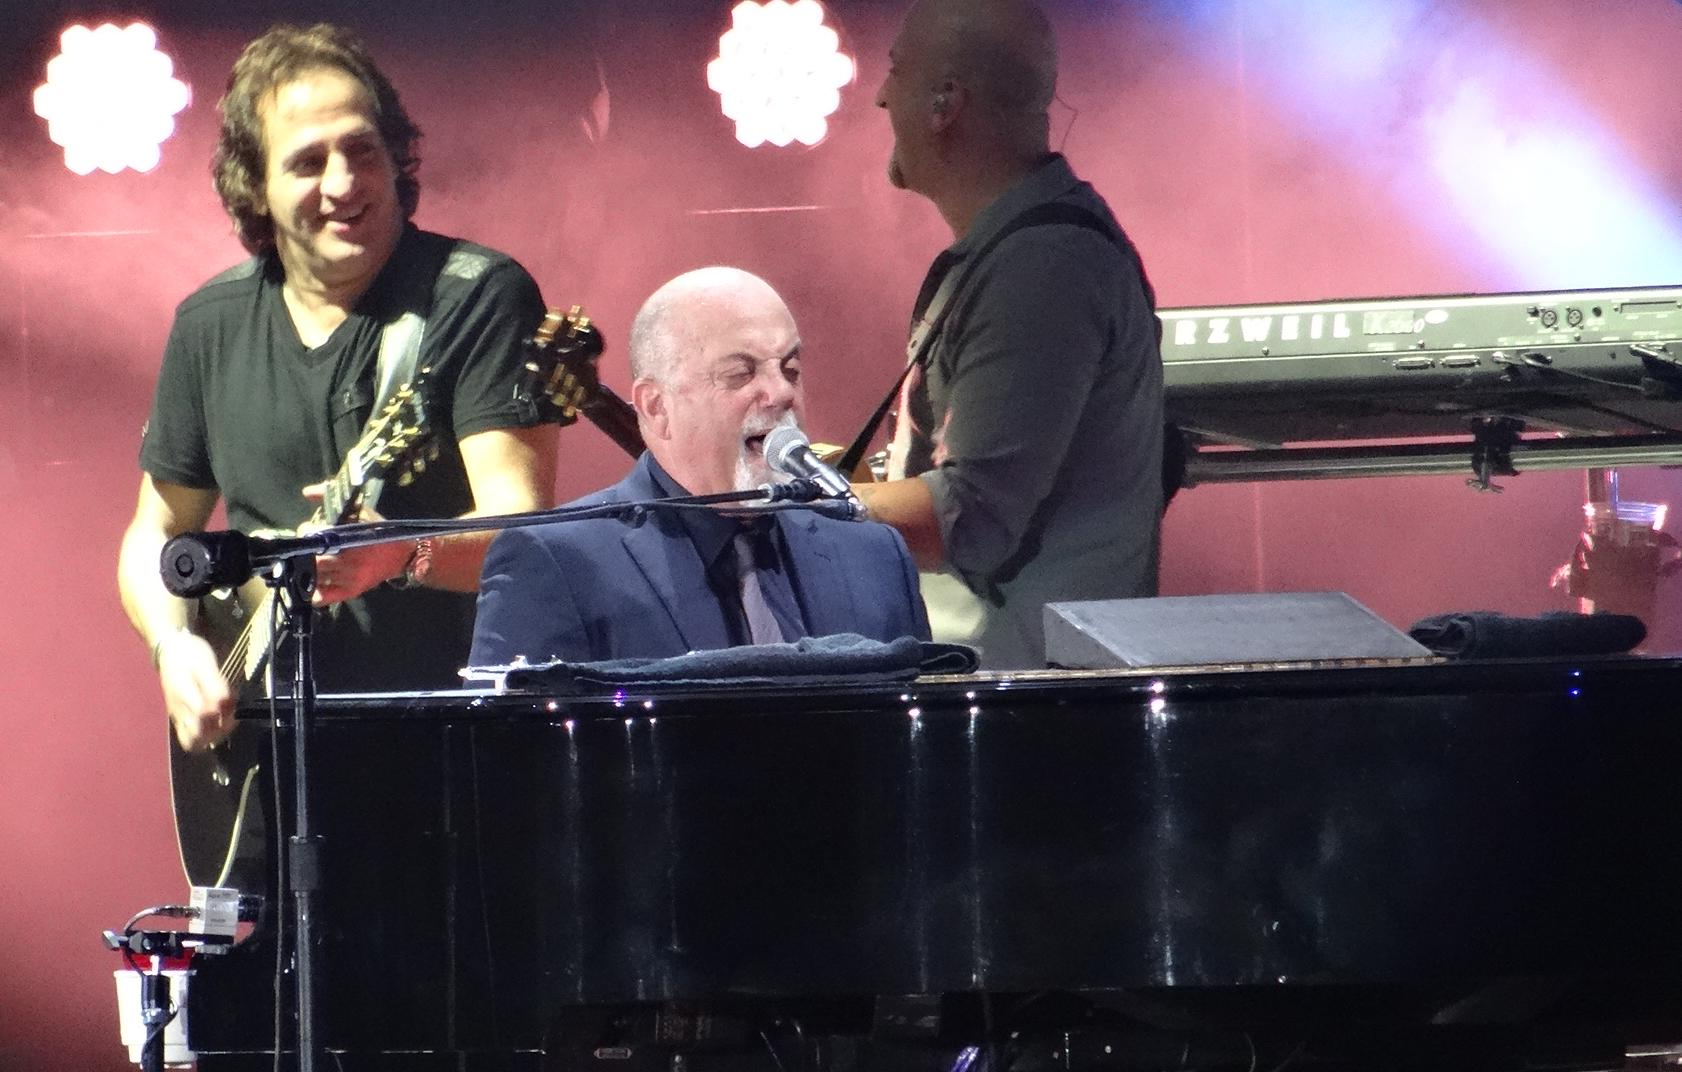 billy joel playing piano - photo #22